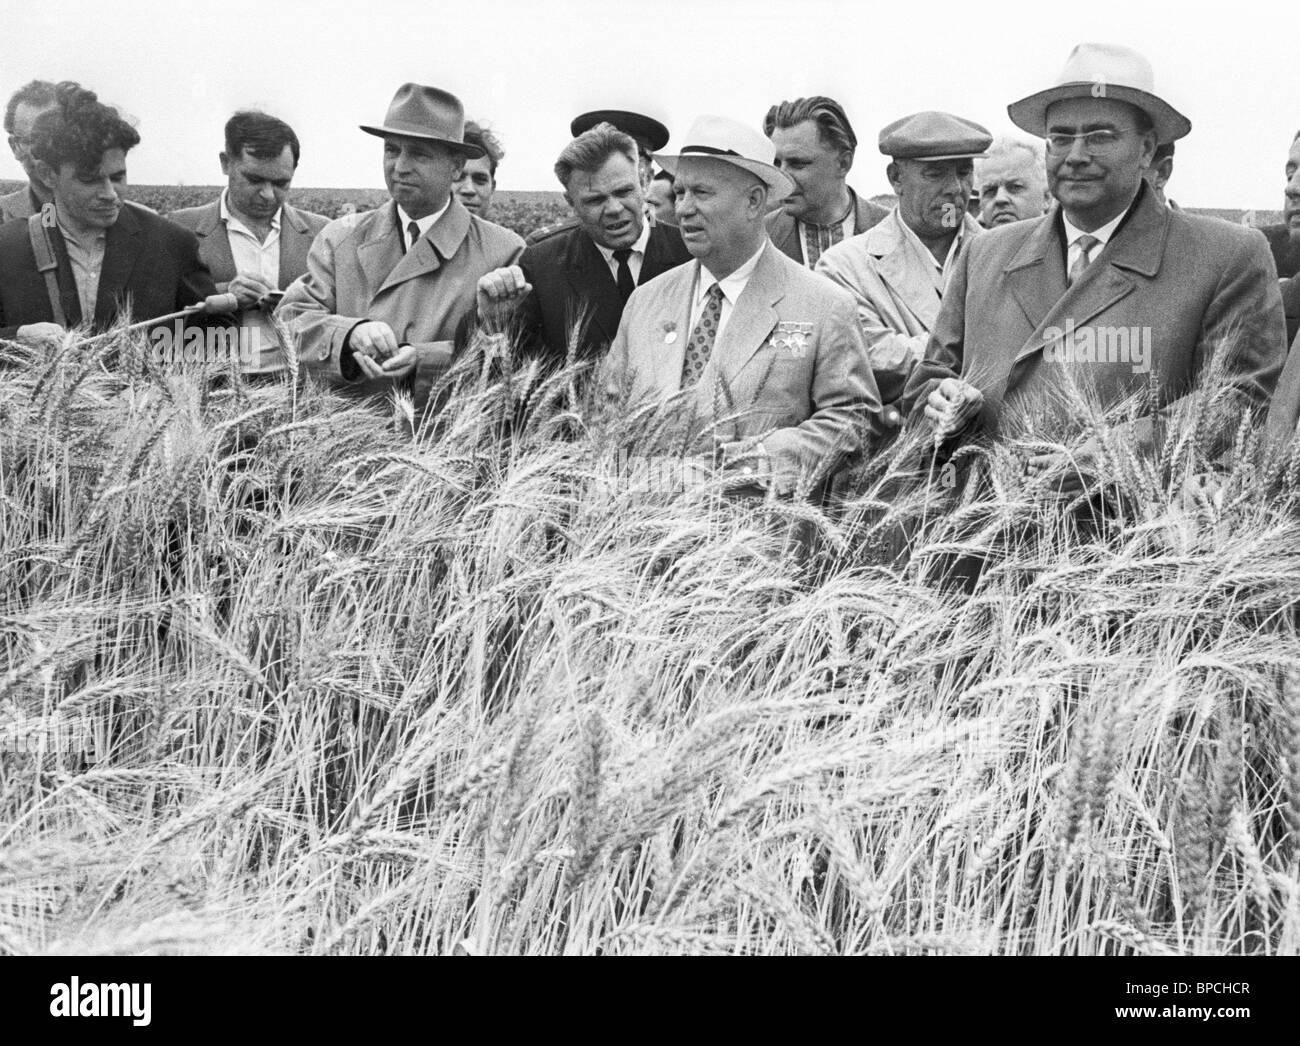 Nikita Khrushchev in Kursk region, 1962 - Stock Image